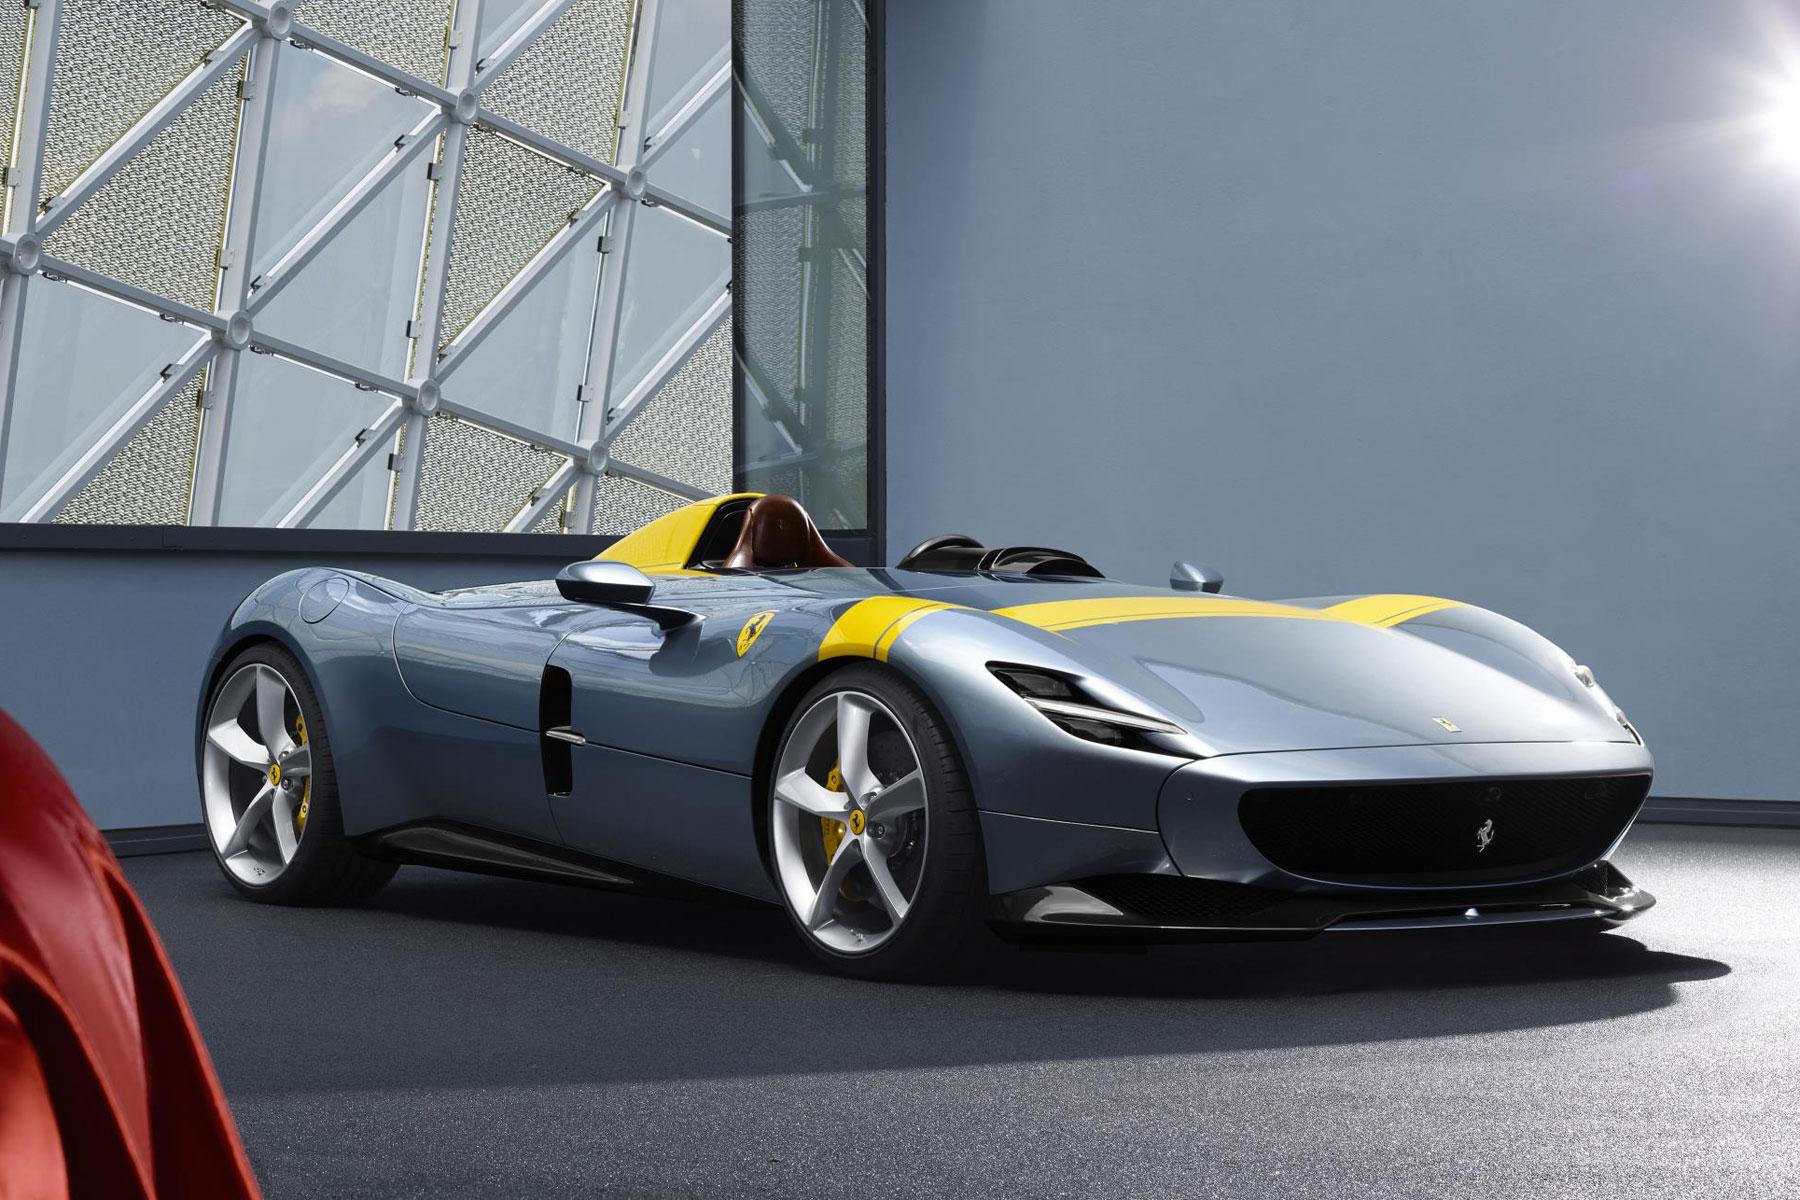 Ferrari Monza SP1/SP2 – 2.9 seconds